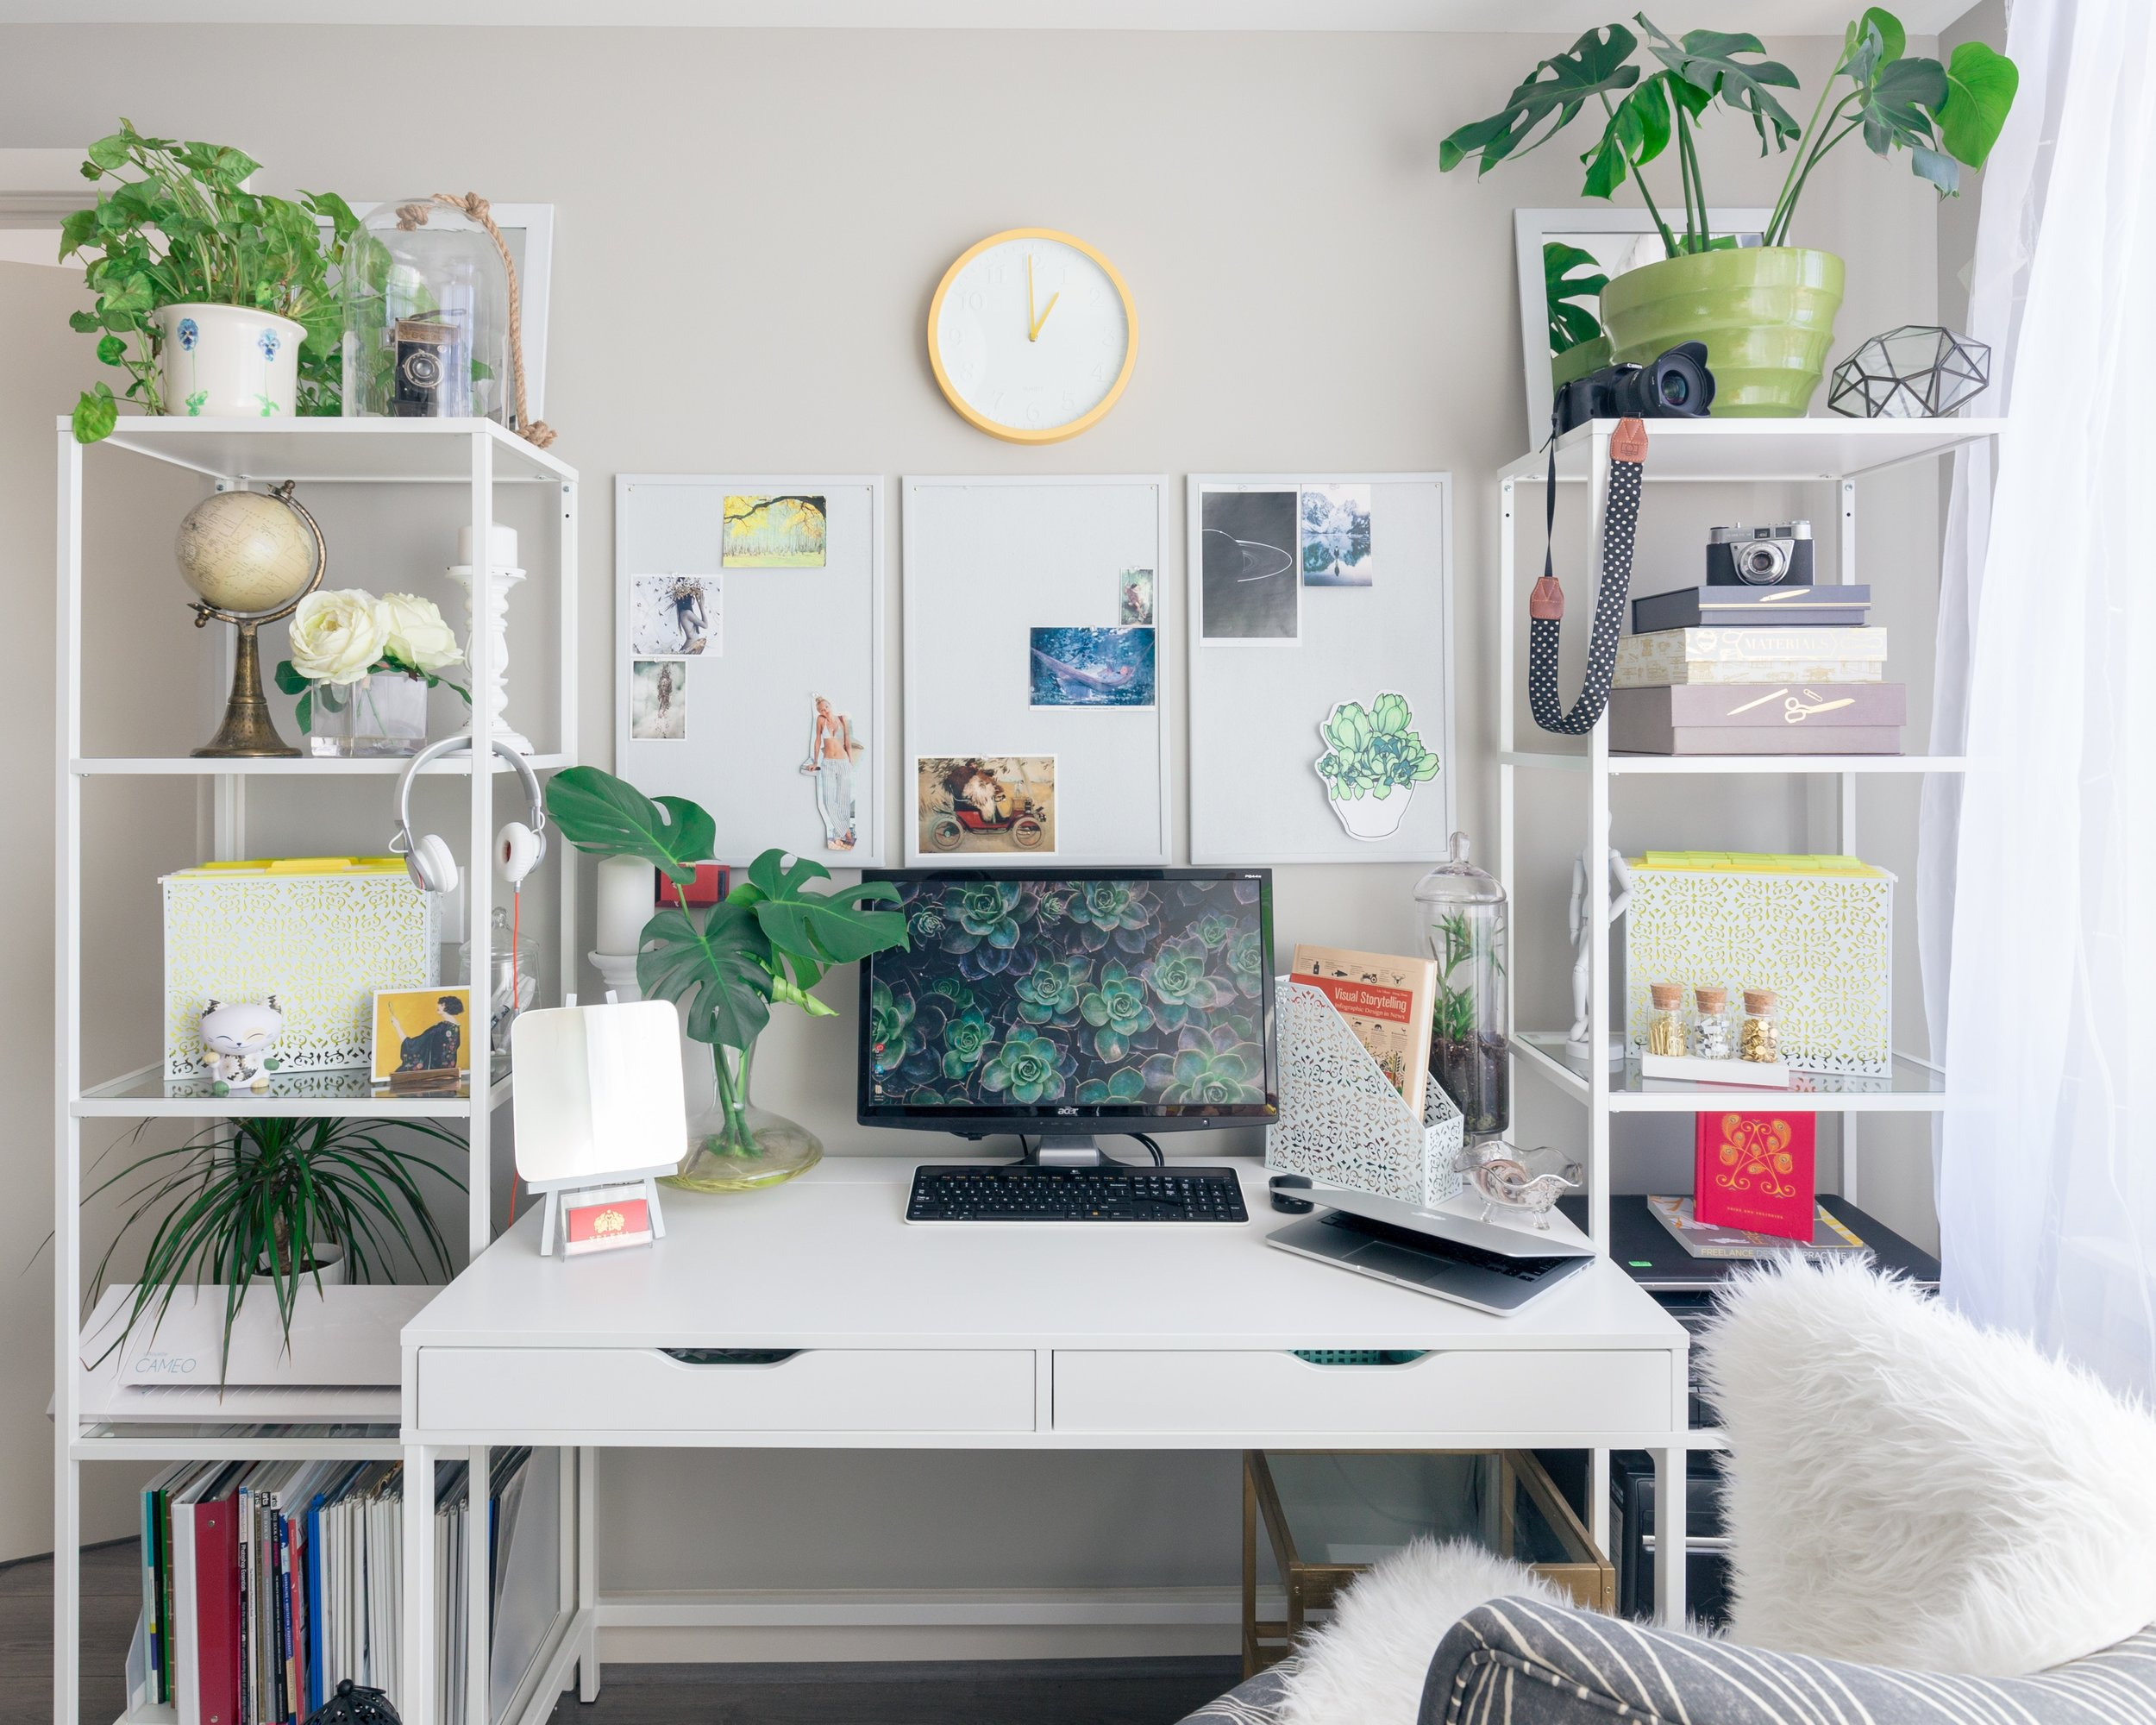 oficina-verde-invictus.jpg